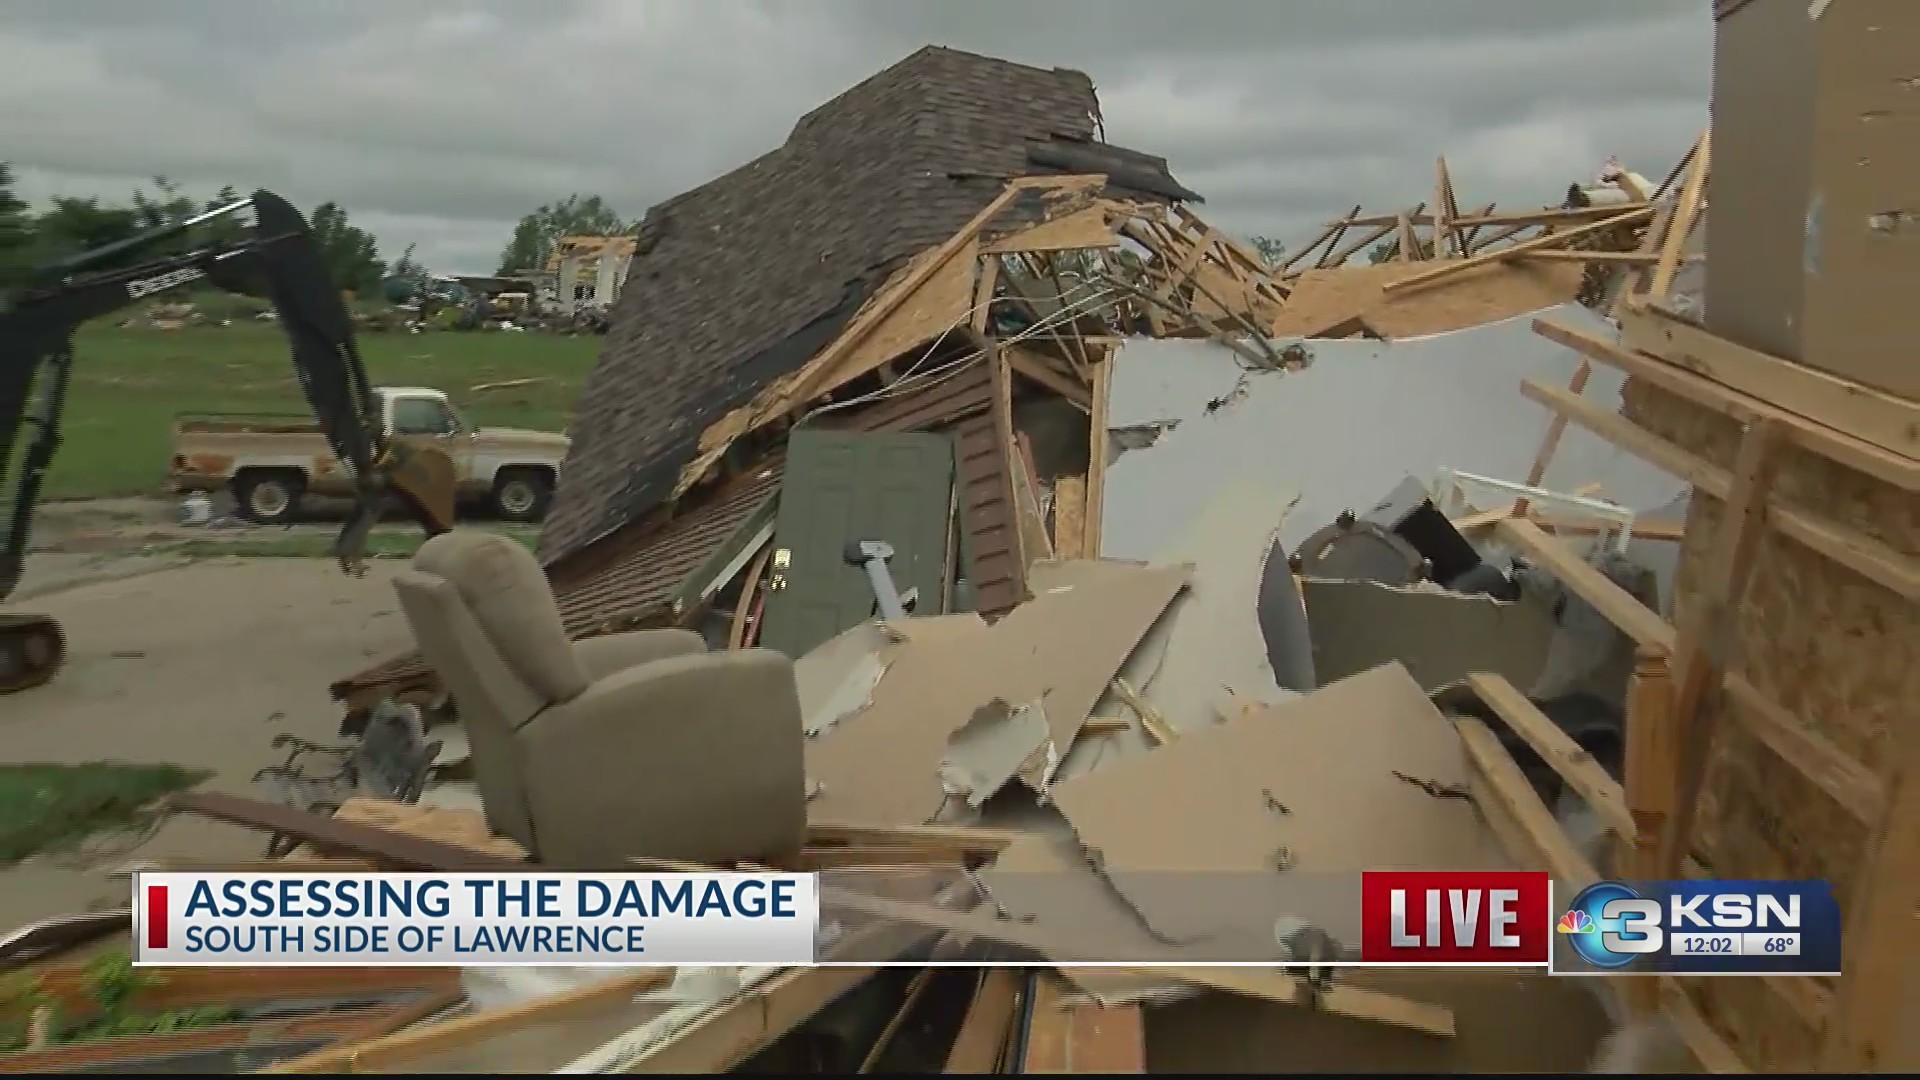 KSN_gets_look_at_tornado_devastation_sou_0_20190529171547-846624078